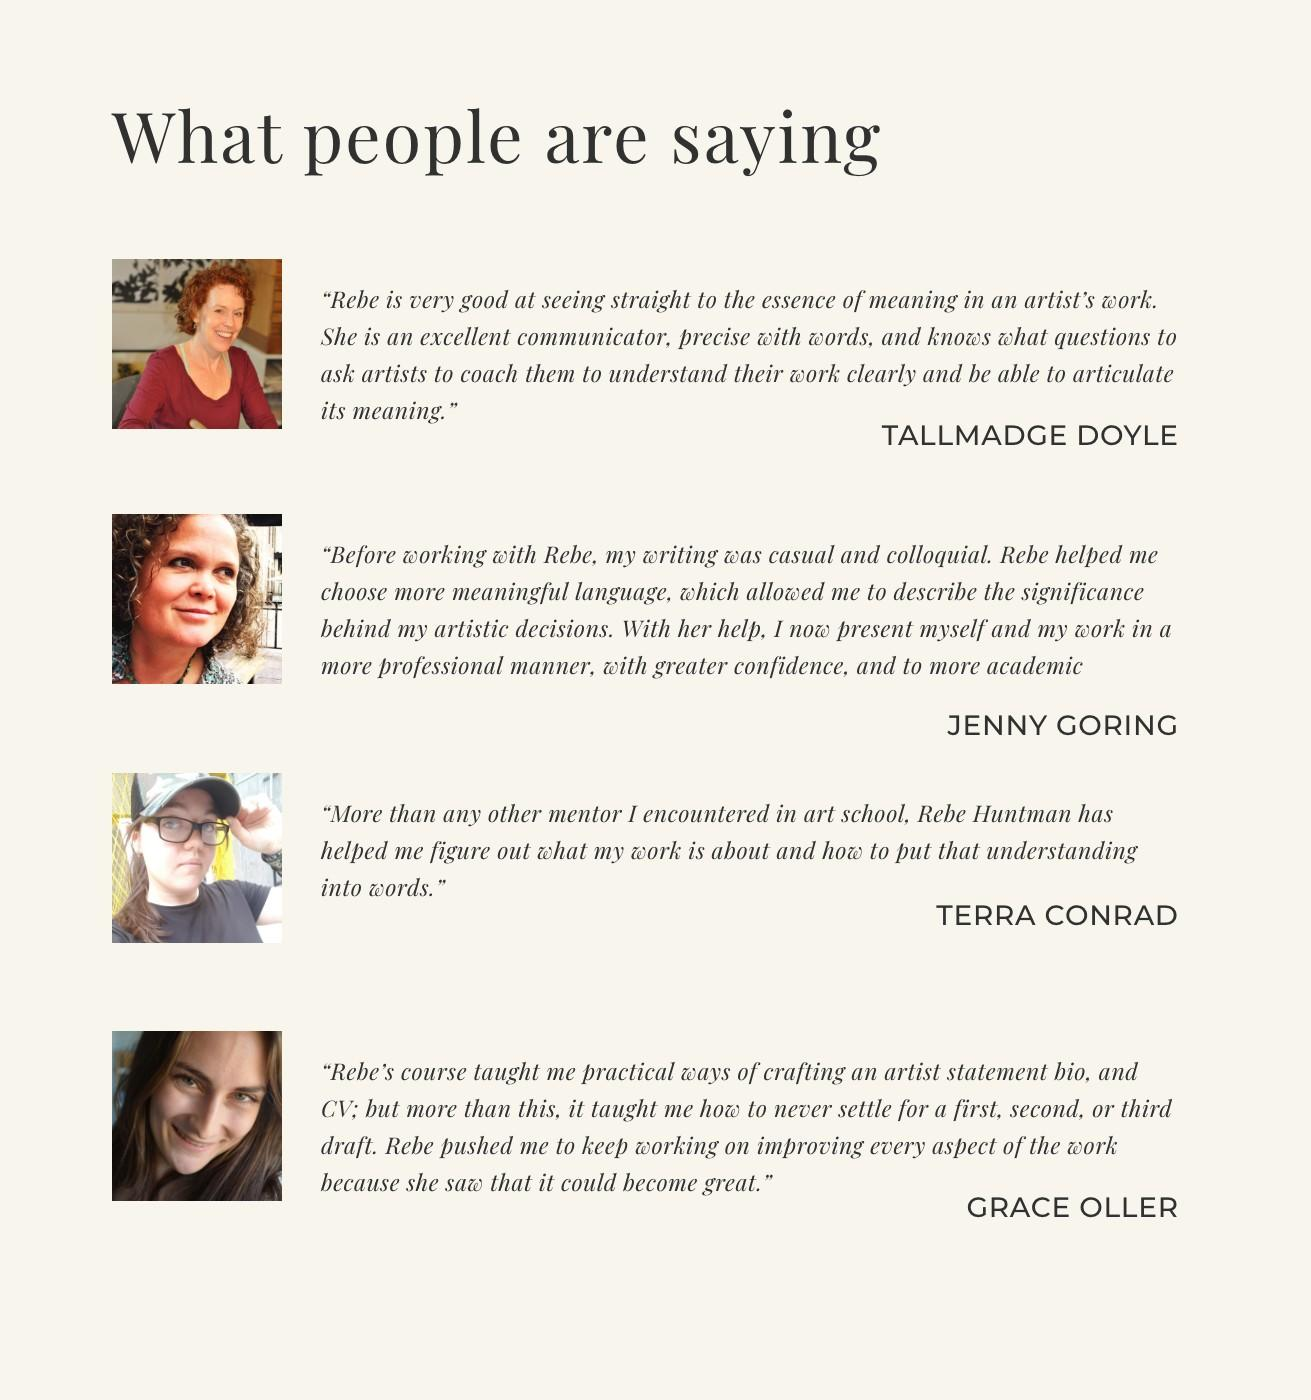 Artists Tallmadge Doyle, Jenny Goring, Terra Conrad & Grace Oller give testimonials about writing coach Rebe Huntman